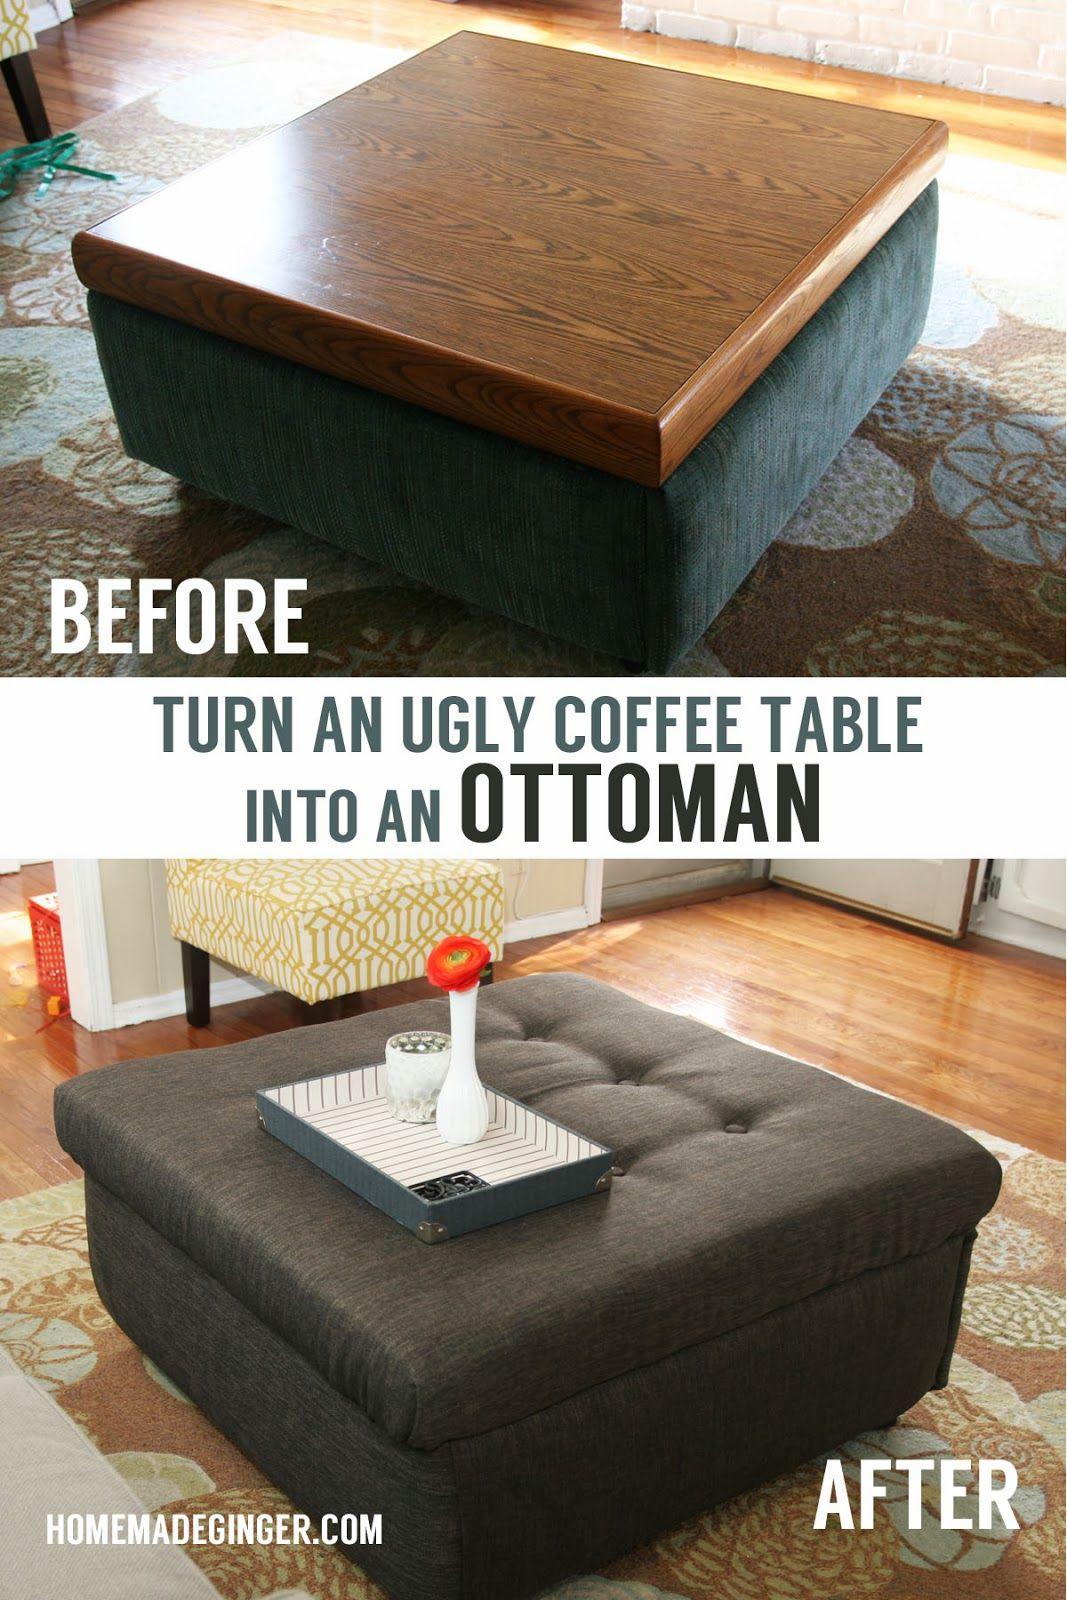 Turn an Ugly Coffee Table into an DIY Ottoman | Tapizado, Cama silla ...